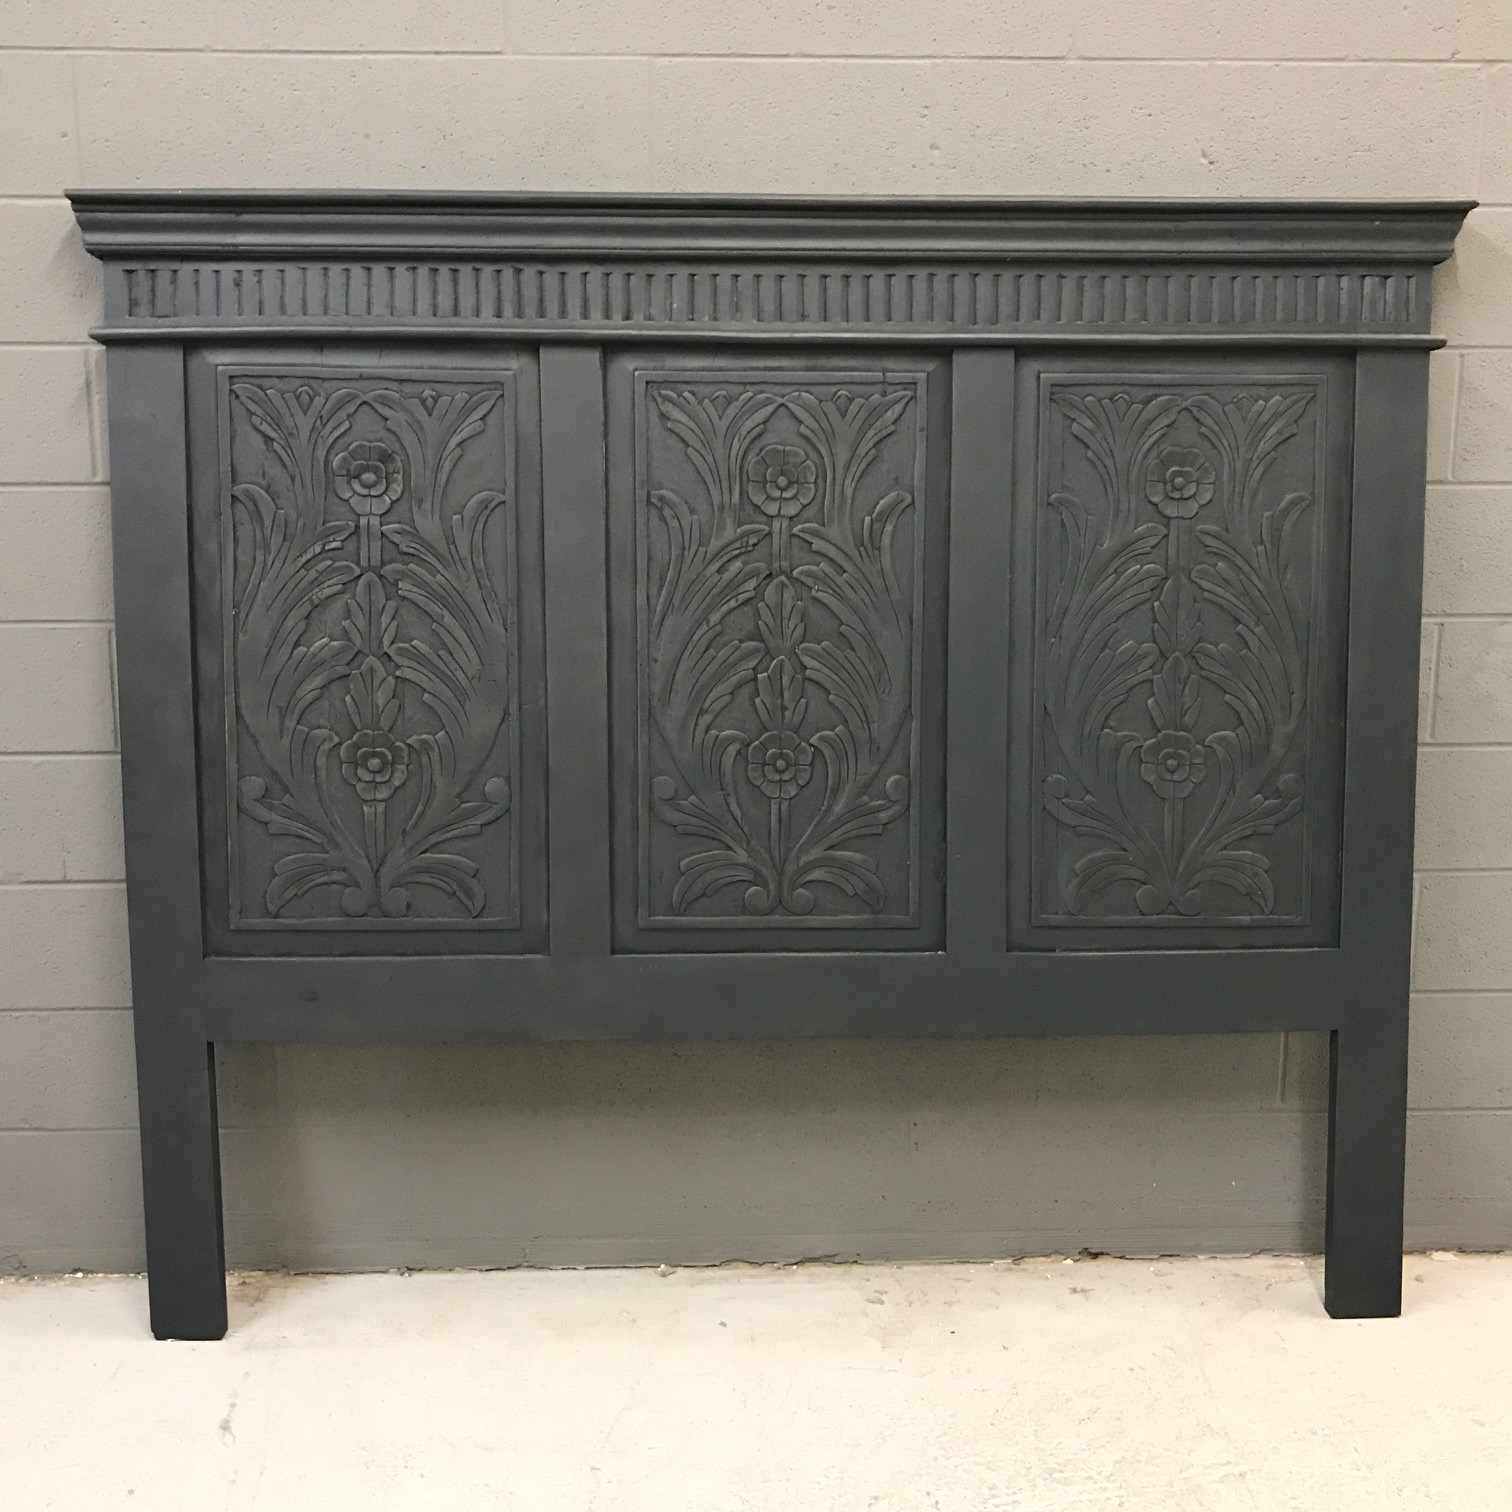 Nadeau Furniture Nashville #31 - King Headboard